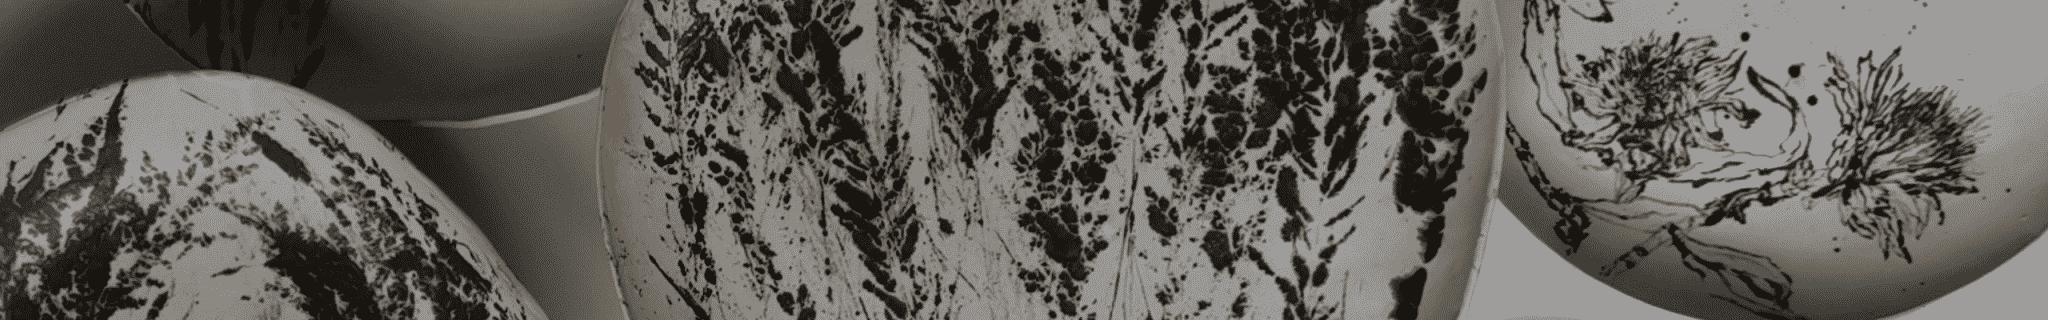 Eylene Clifford – Printing with Majolica